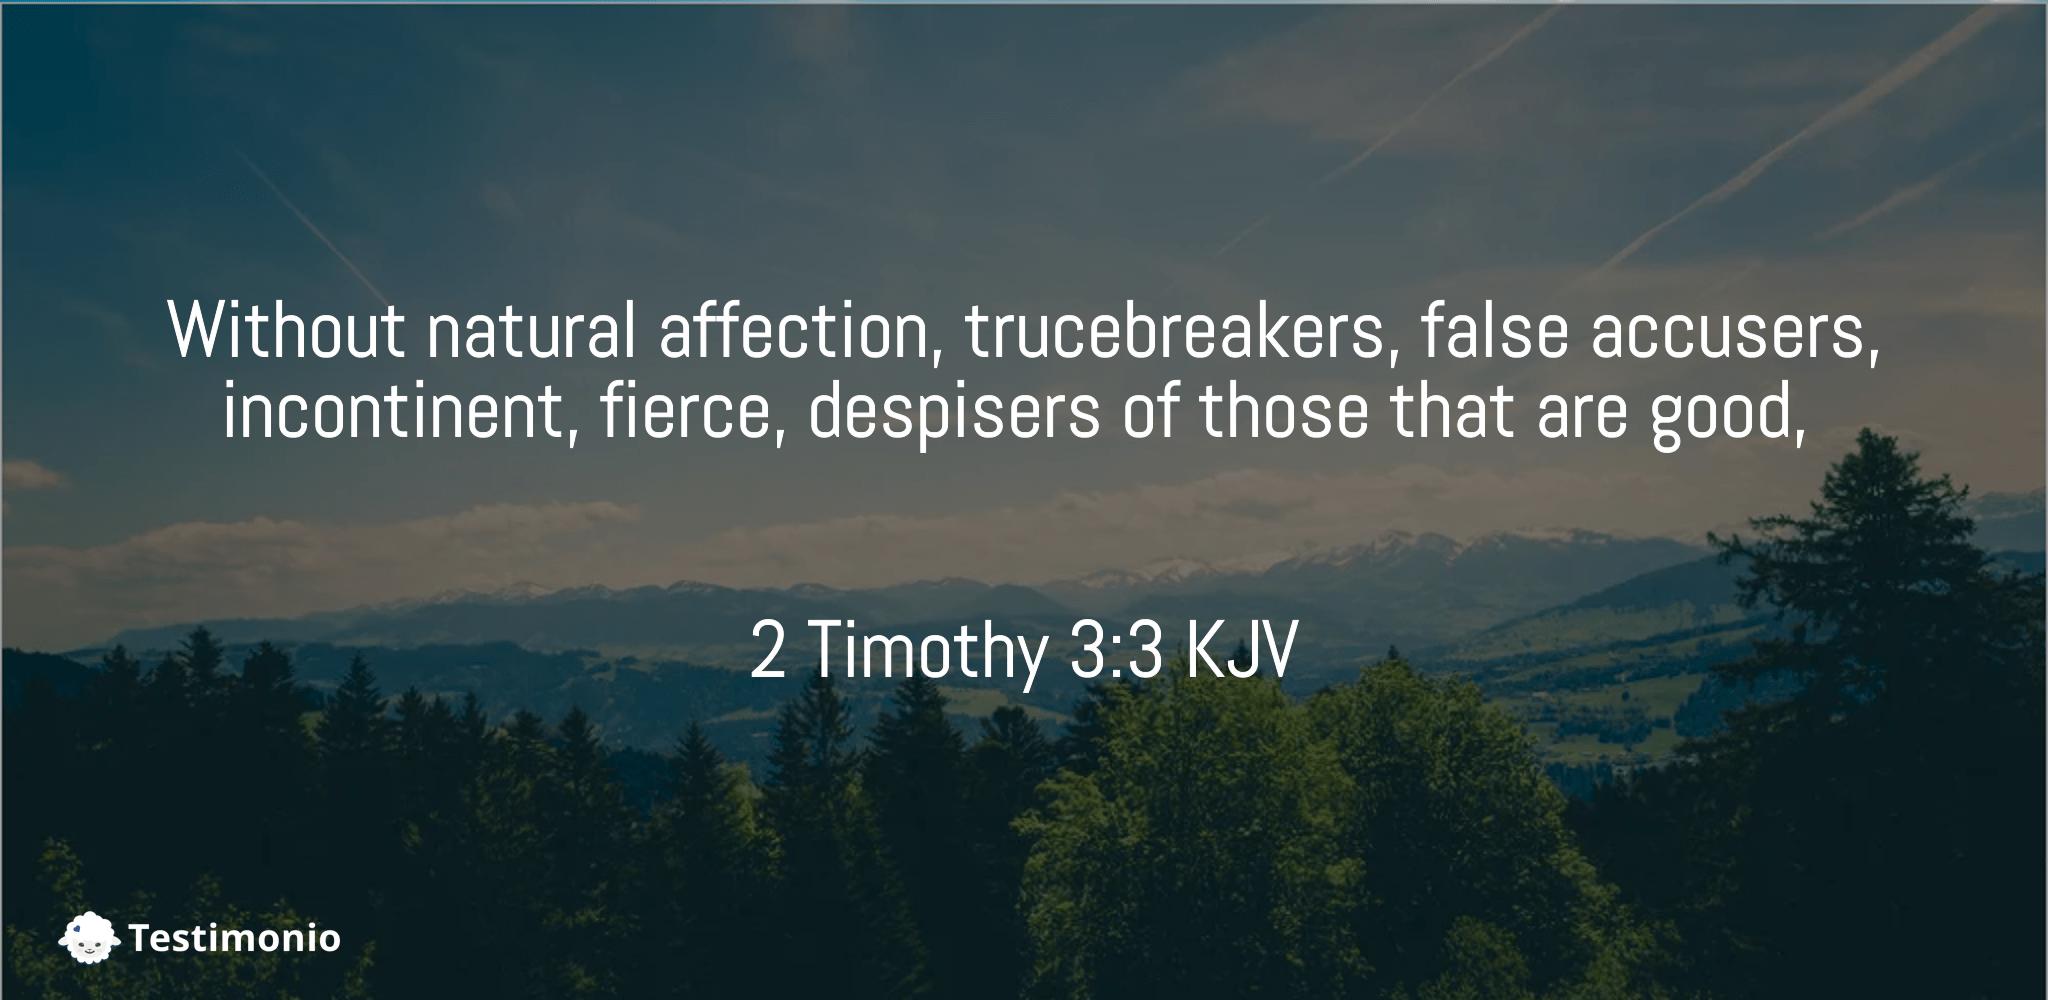 2 Timothy 3:3